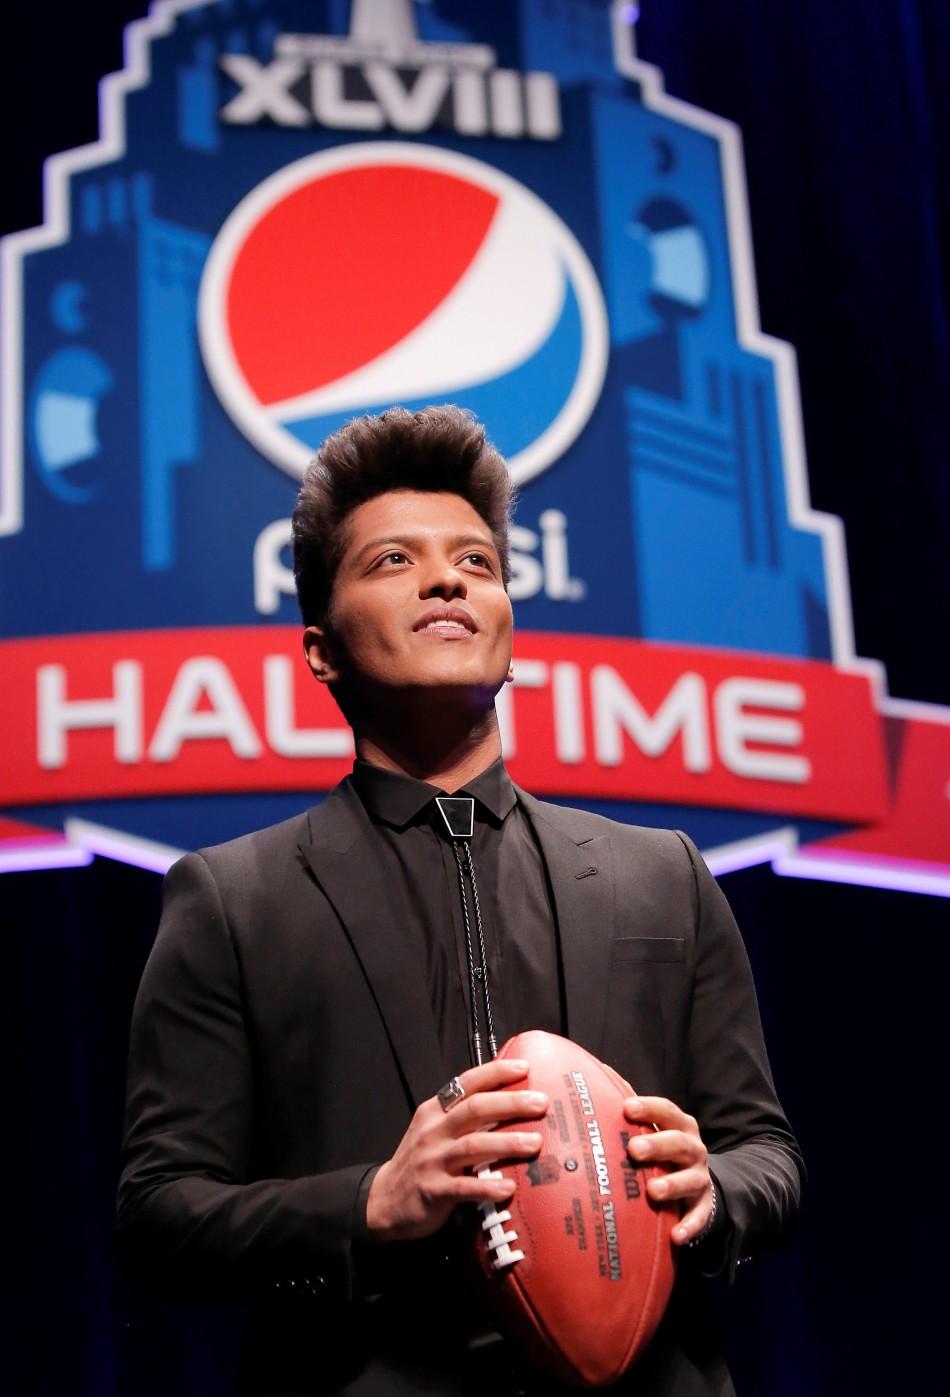 Rock en la Super Bowl del fútbol americano, Super Bowl XLVIII Halftime Show